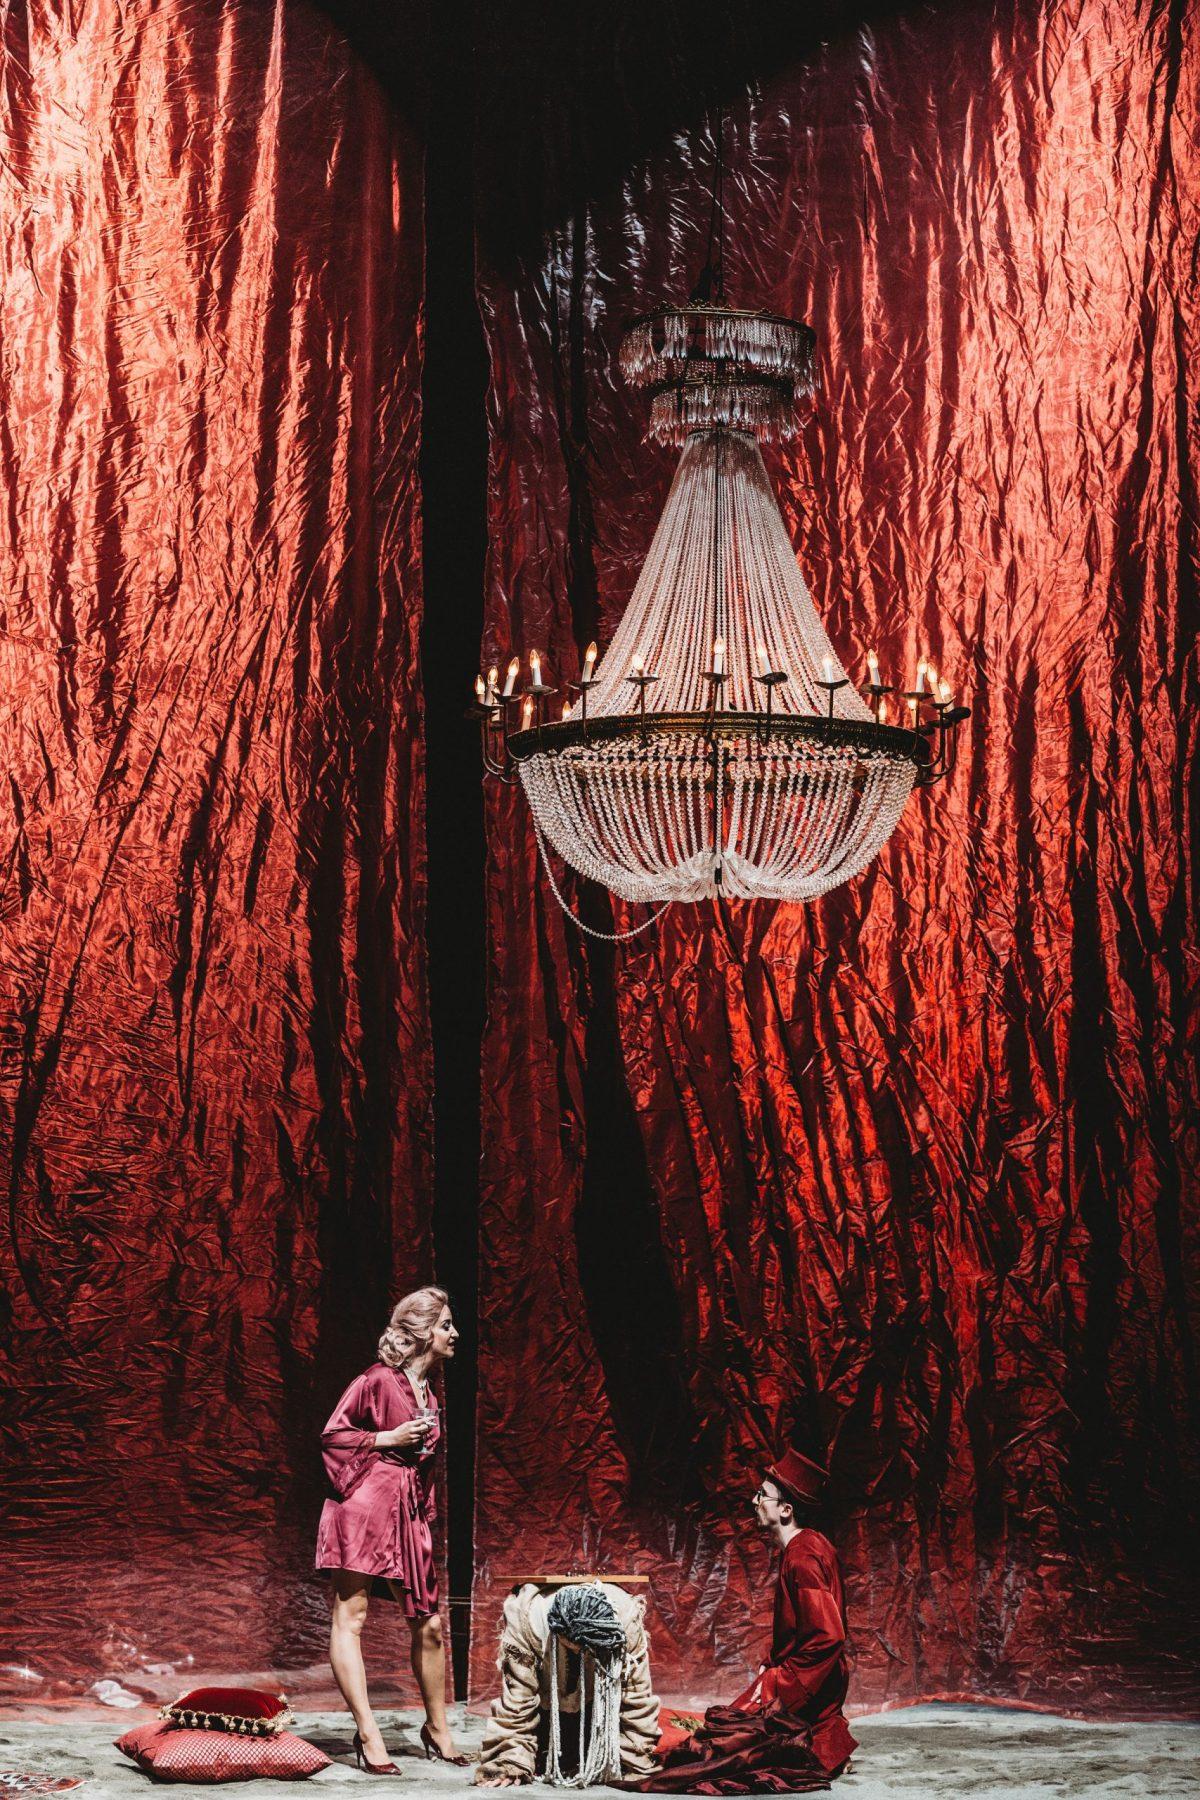 OPERiAMO | Junge Oper Rhein-Main | Caliban | Tiroler Festspiele Erl | Bildnachweis: Xiomara Bender